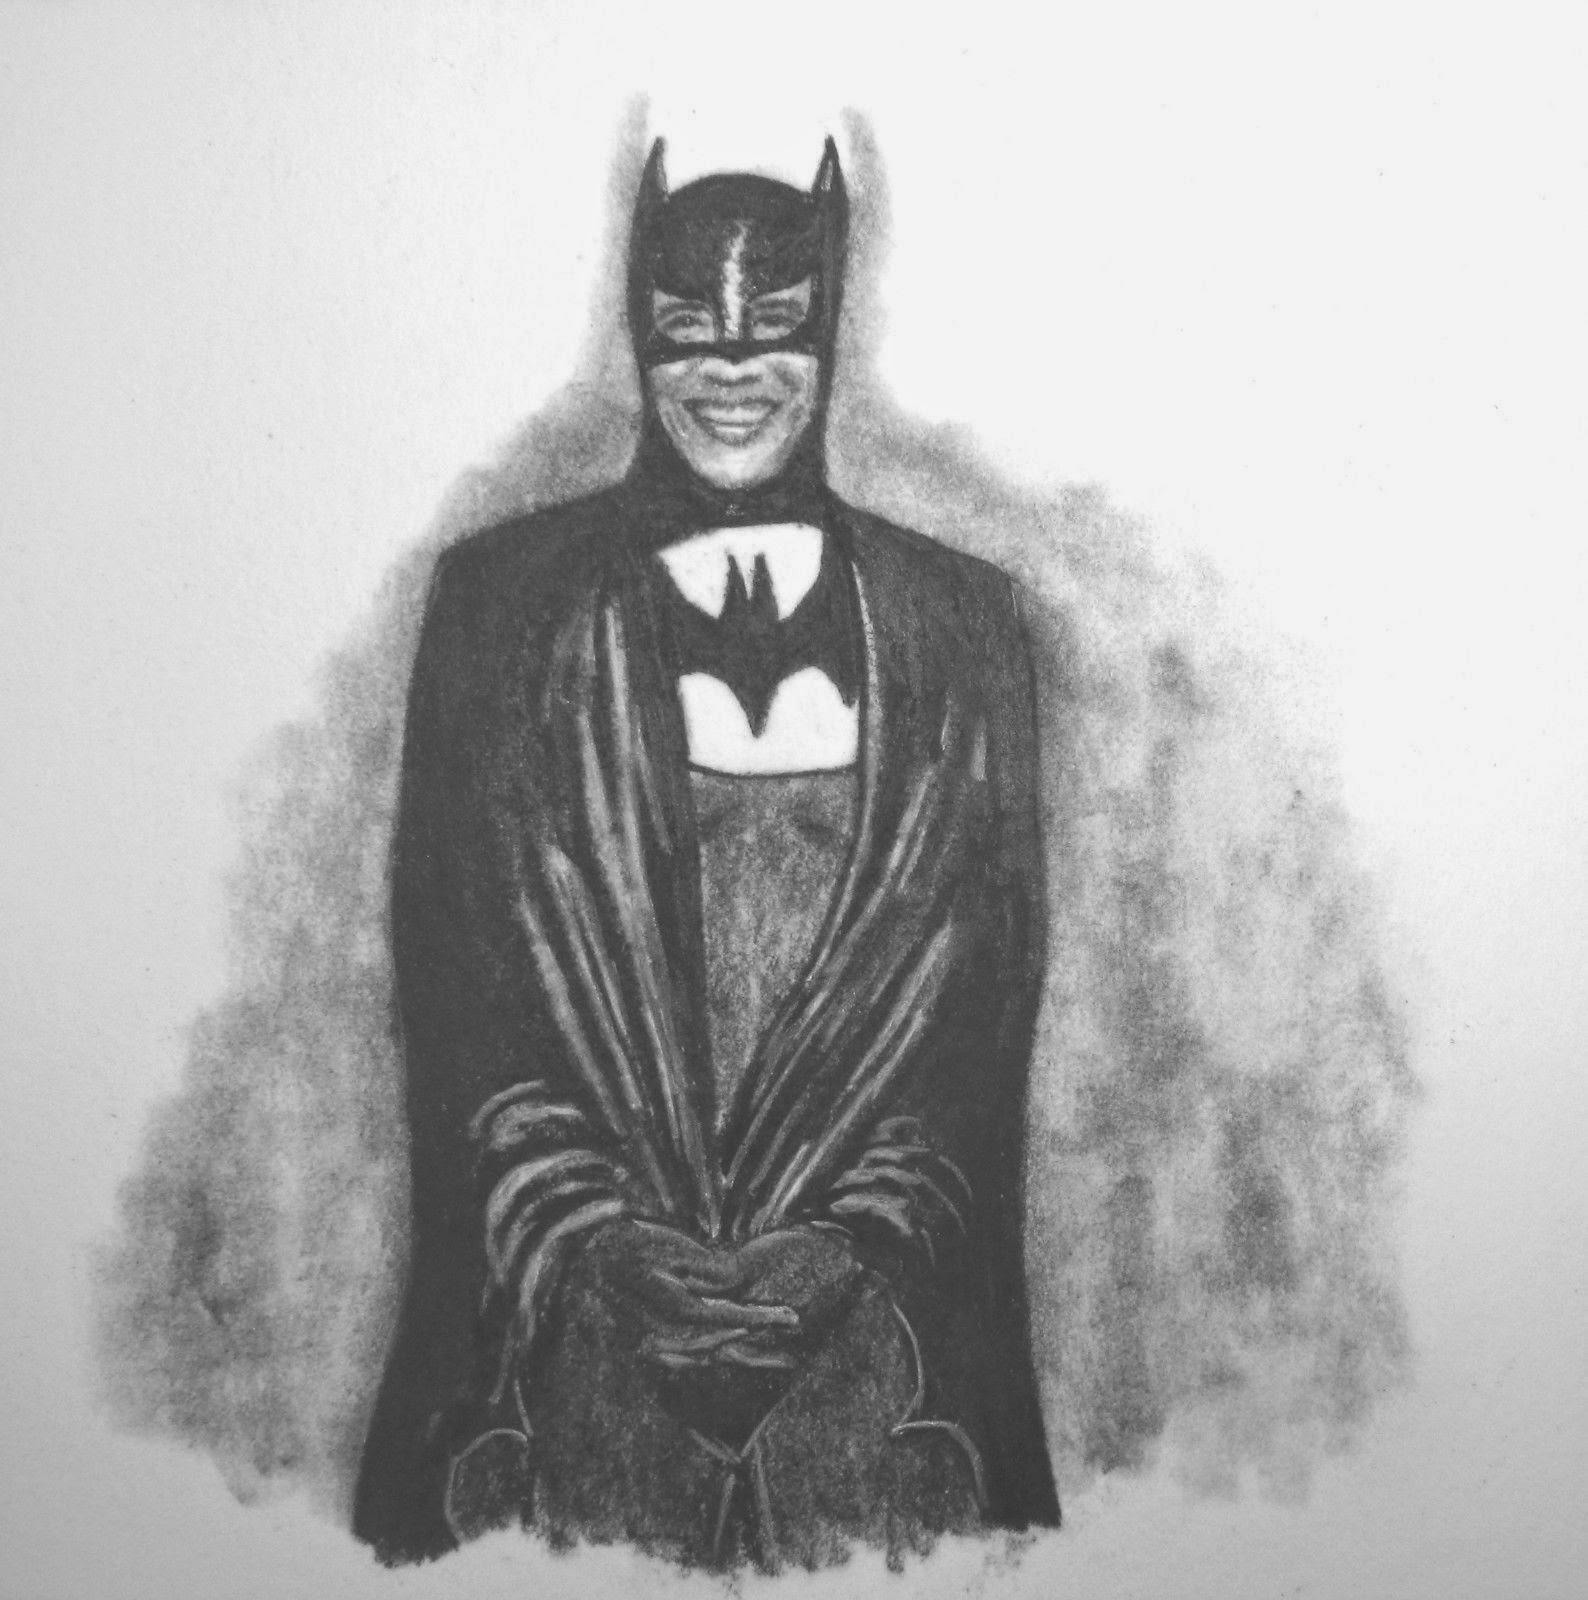 Barack Obama as The Batman by F. Lennox Campello